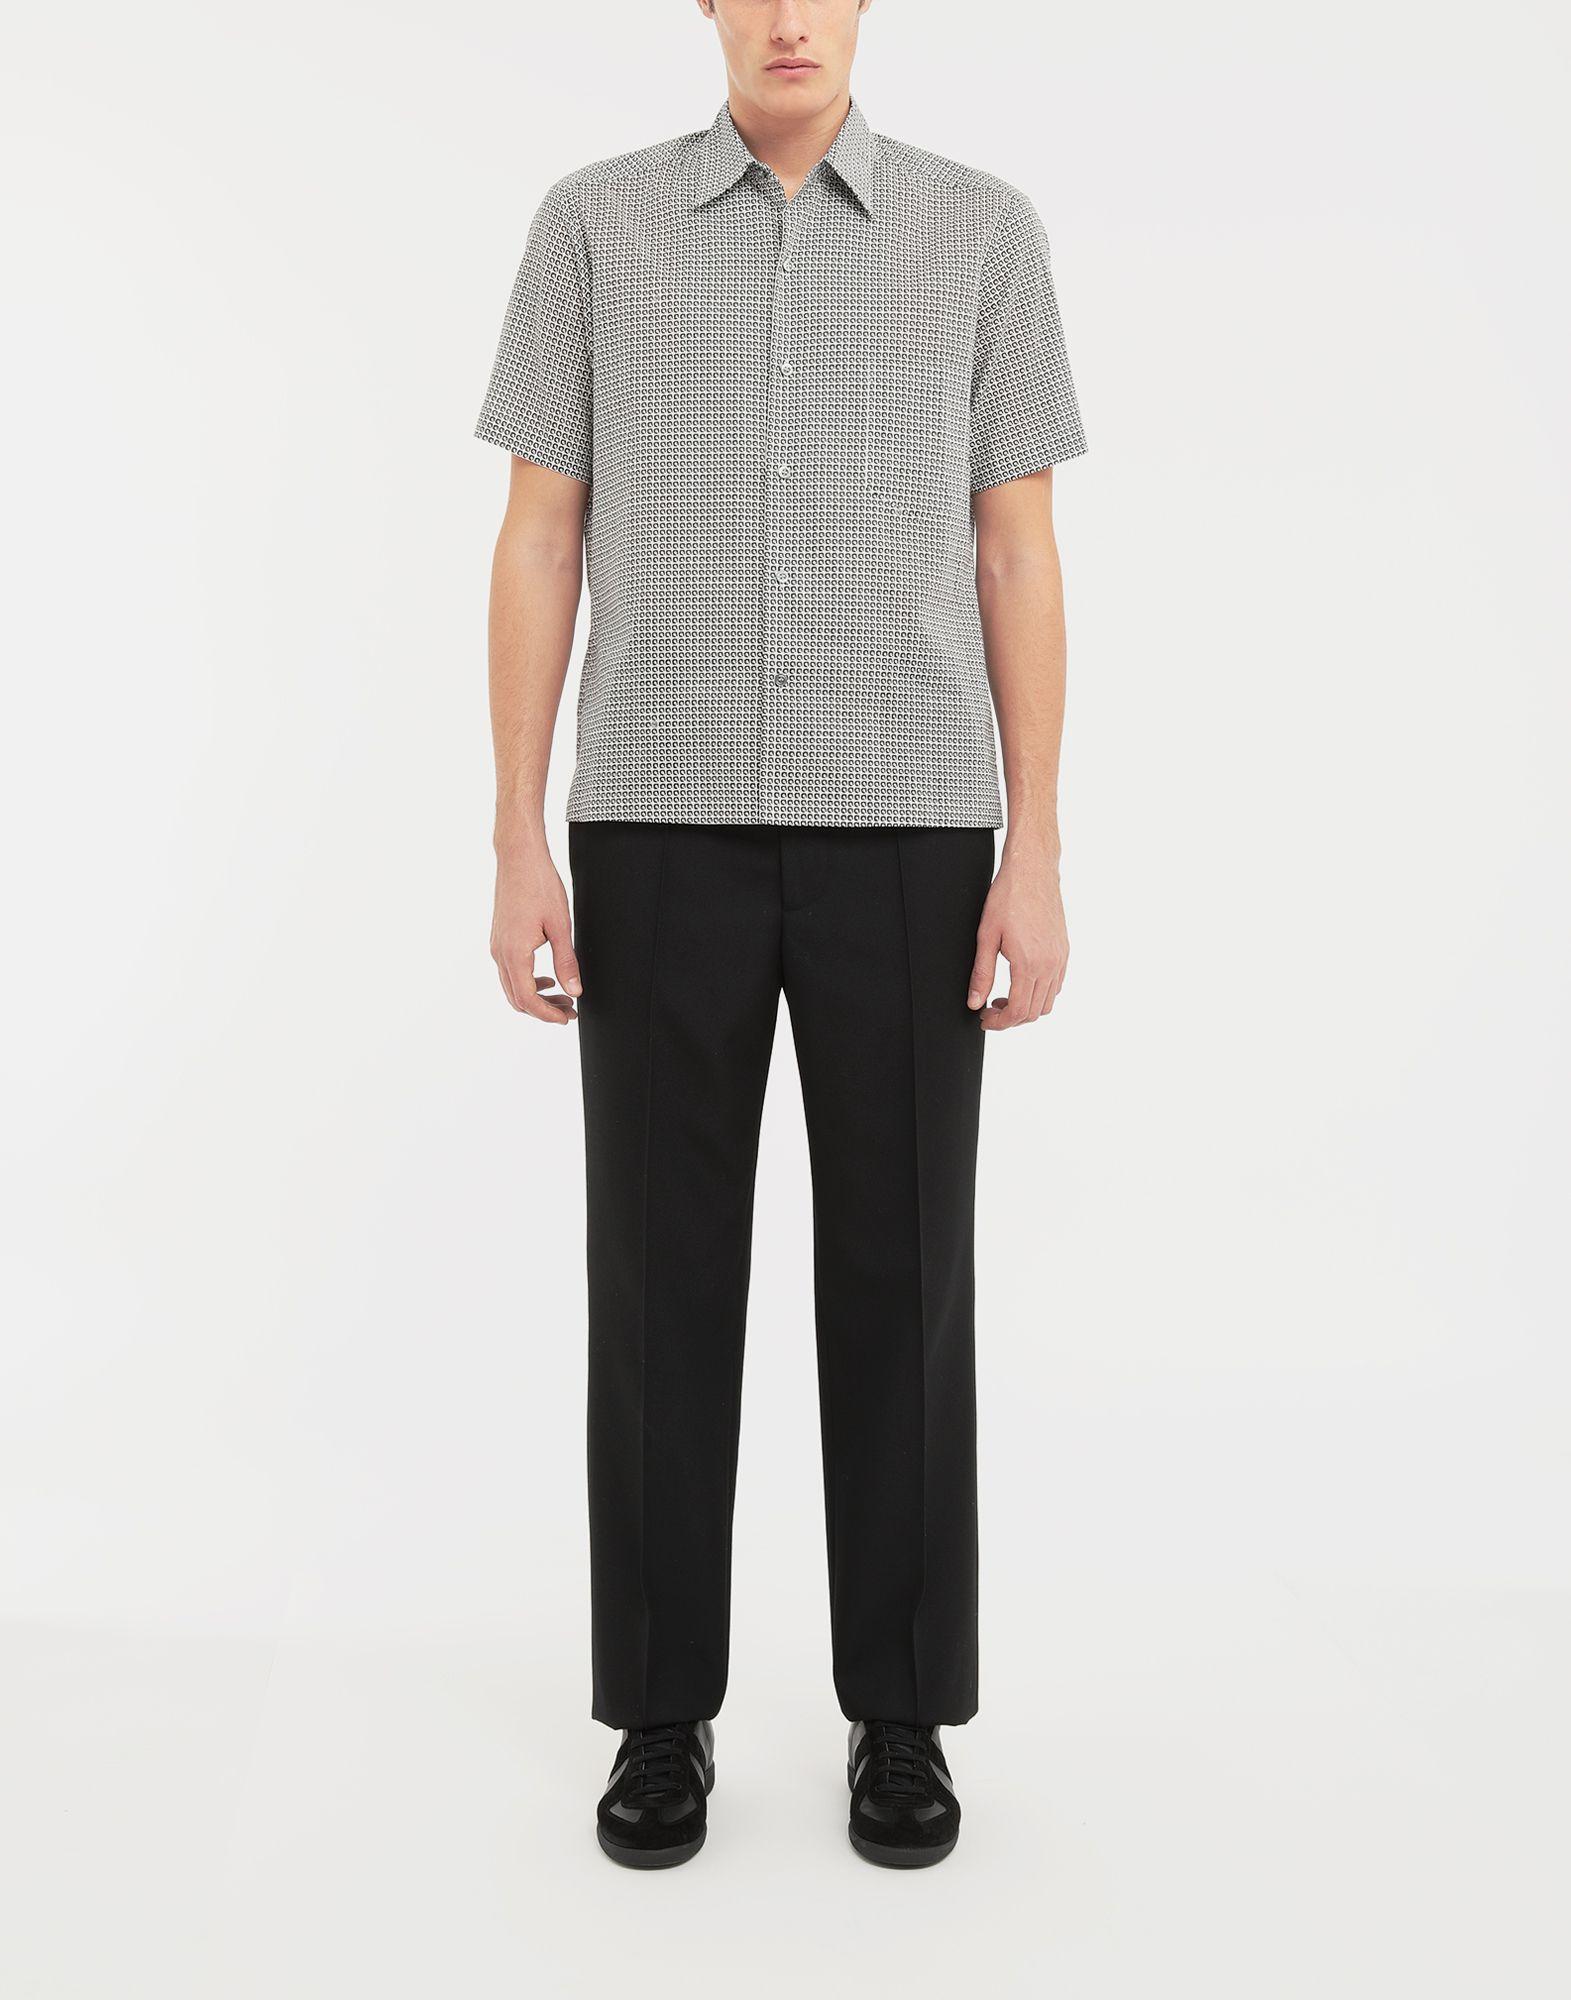 MAISON MARGIELA Micro Square print shirt Short sleeve shirt Man d